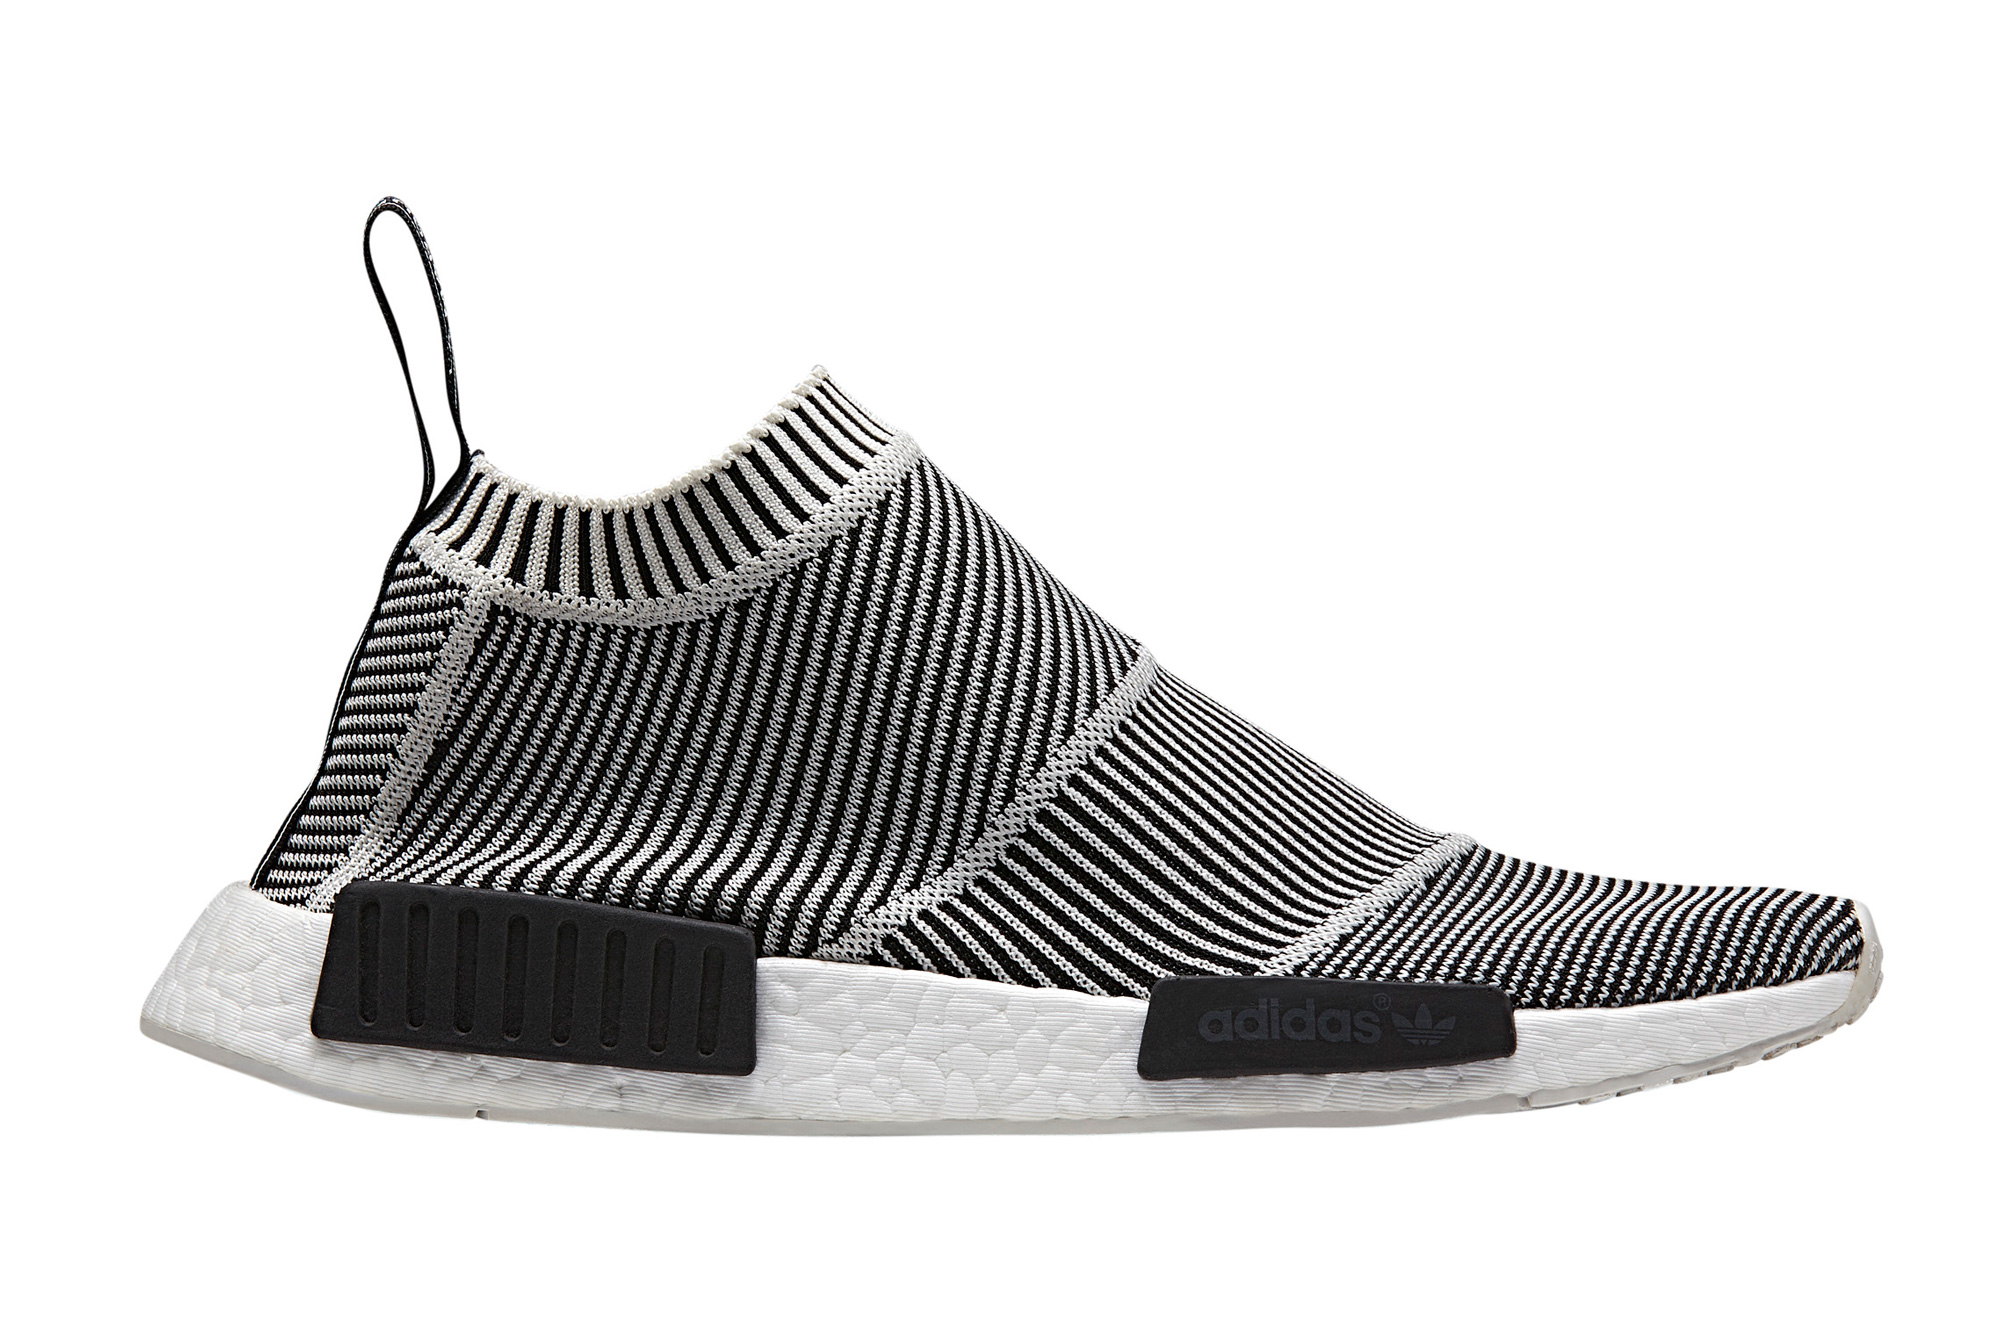 adidas Originals Introduces the NMD City Sock